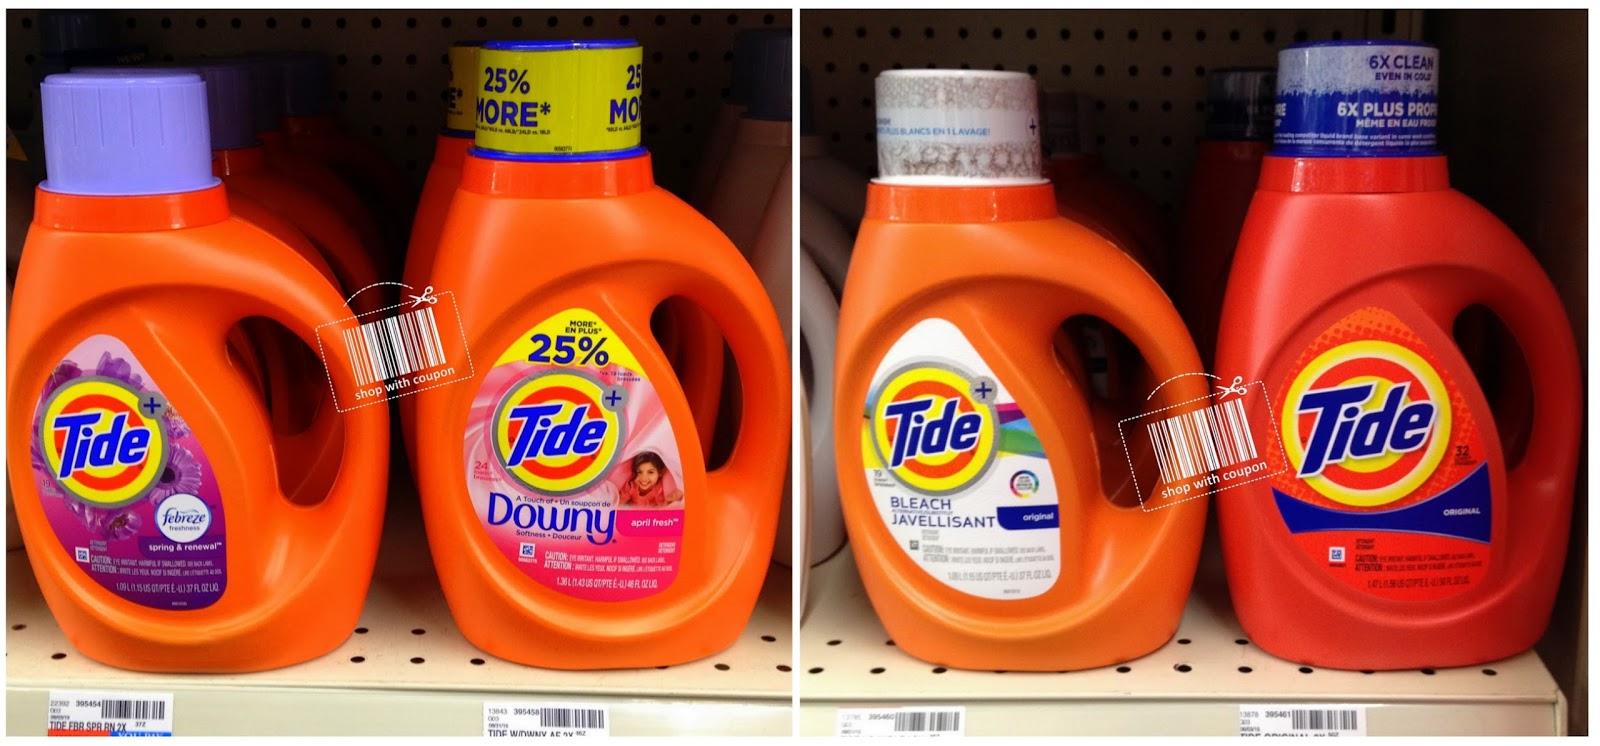 Tide Liquid Laundry Detergent 37 50 Oz